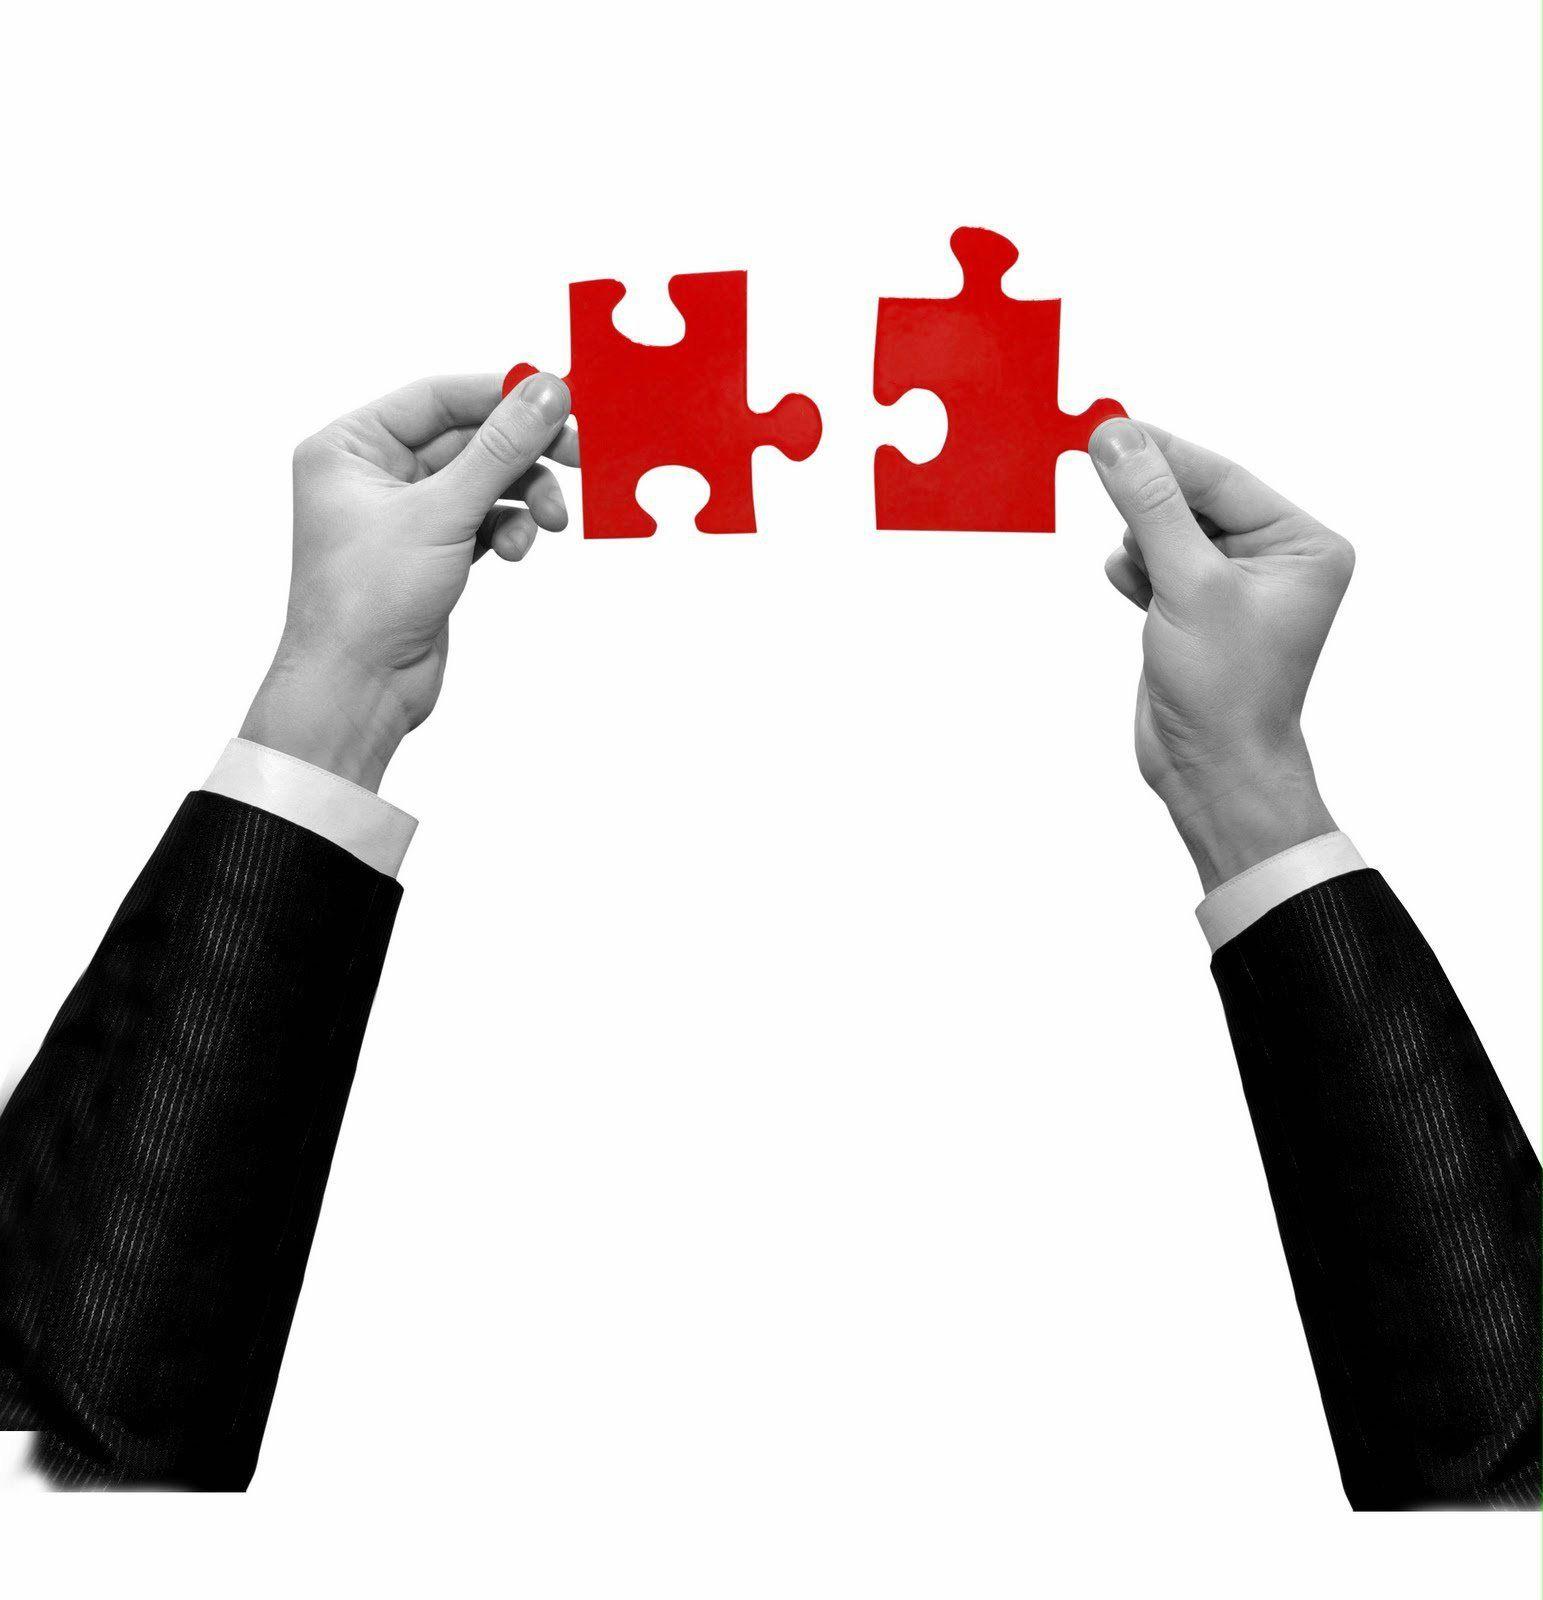 businesscombinationandwhatcircumstancescontributetheformationofbusinesscombination-business